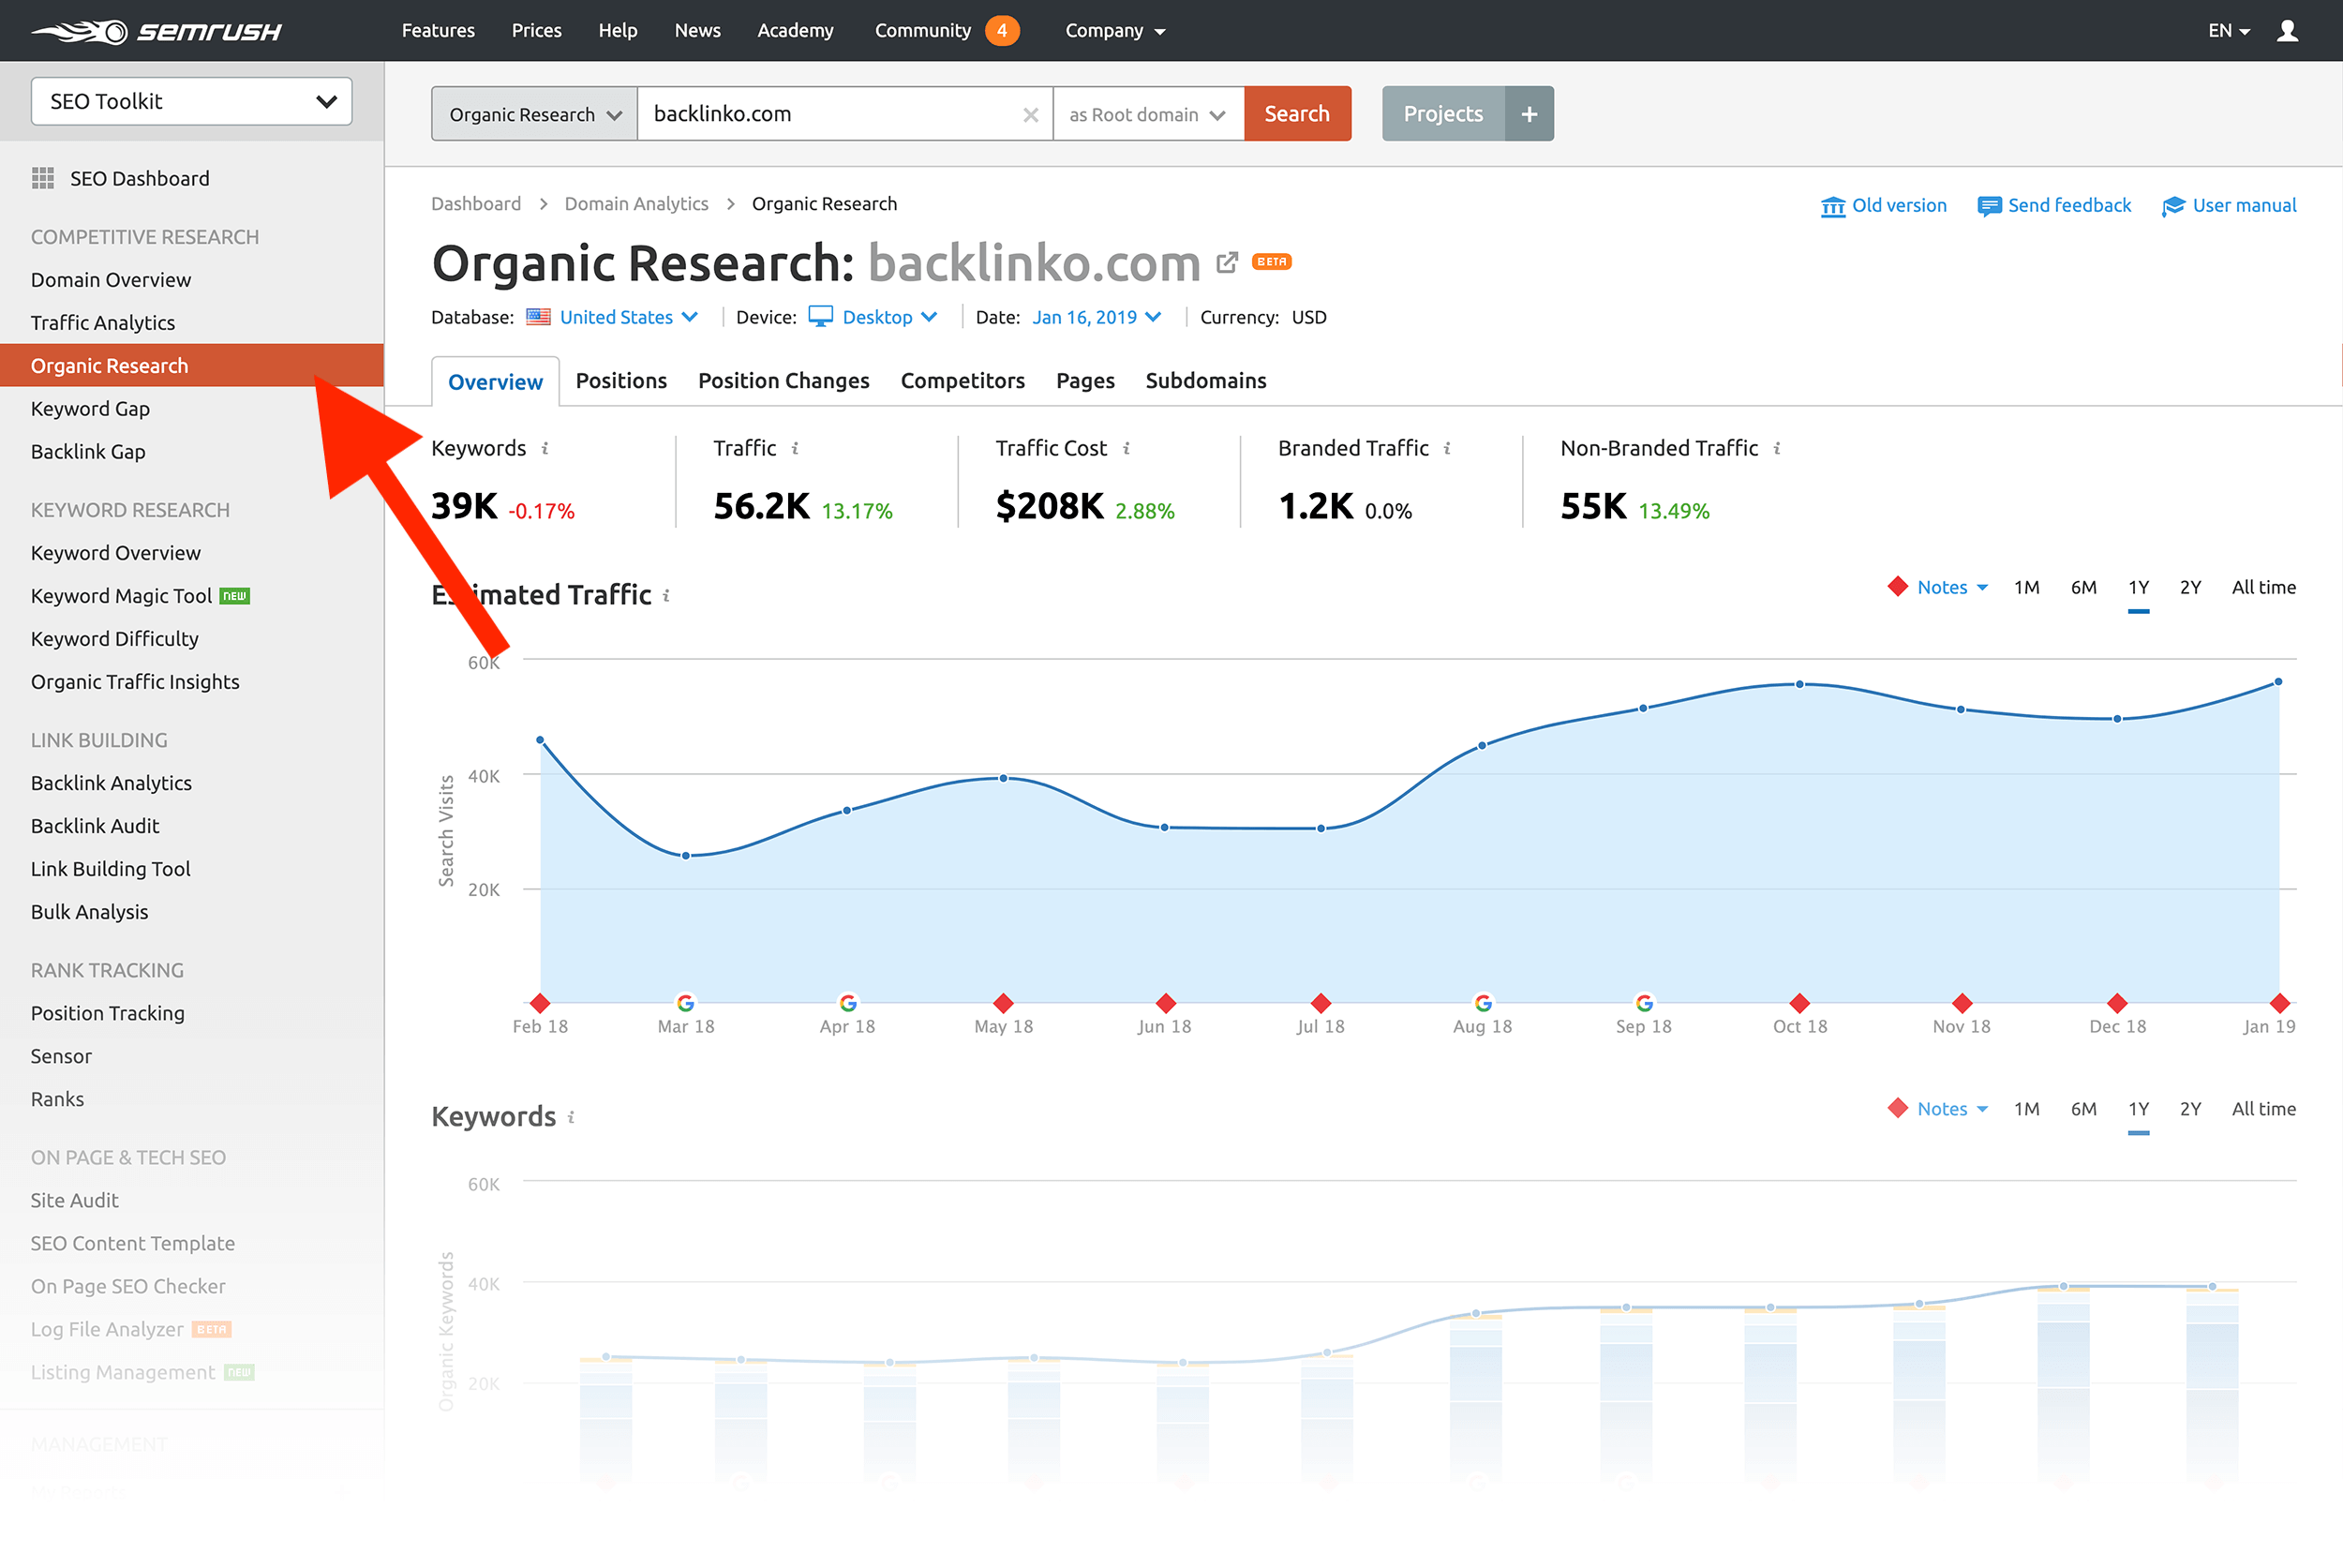 Useful data